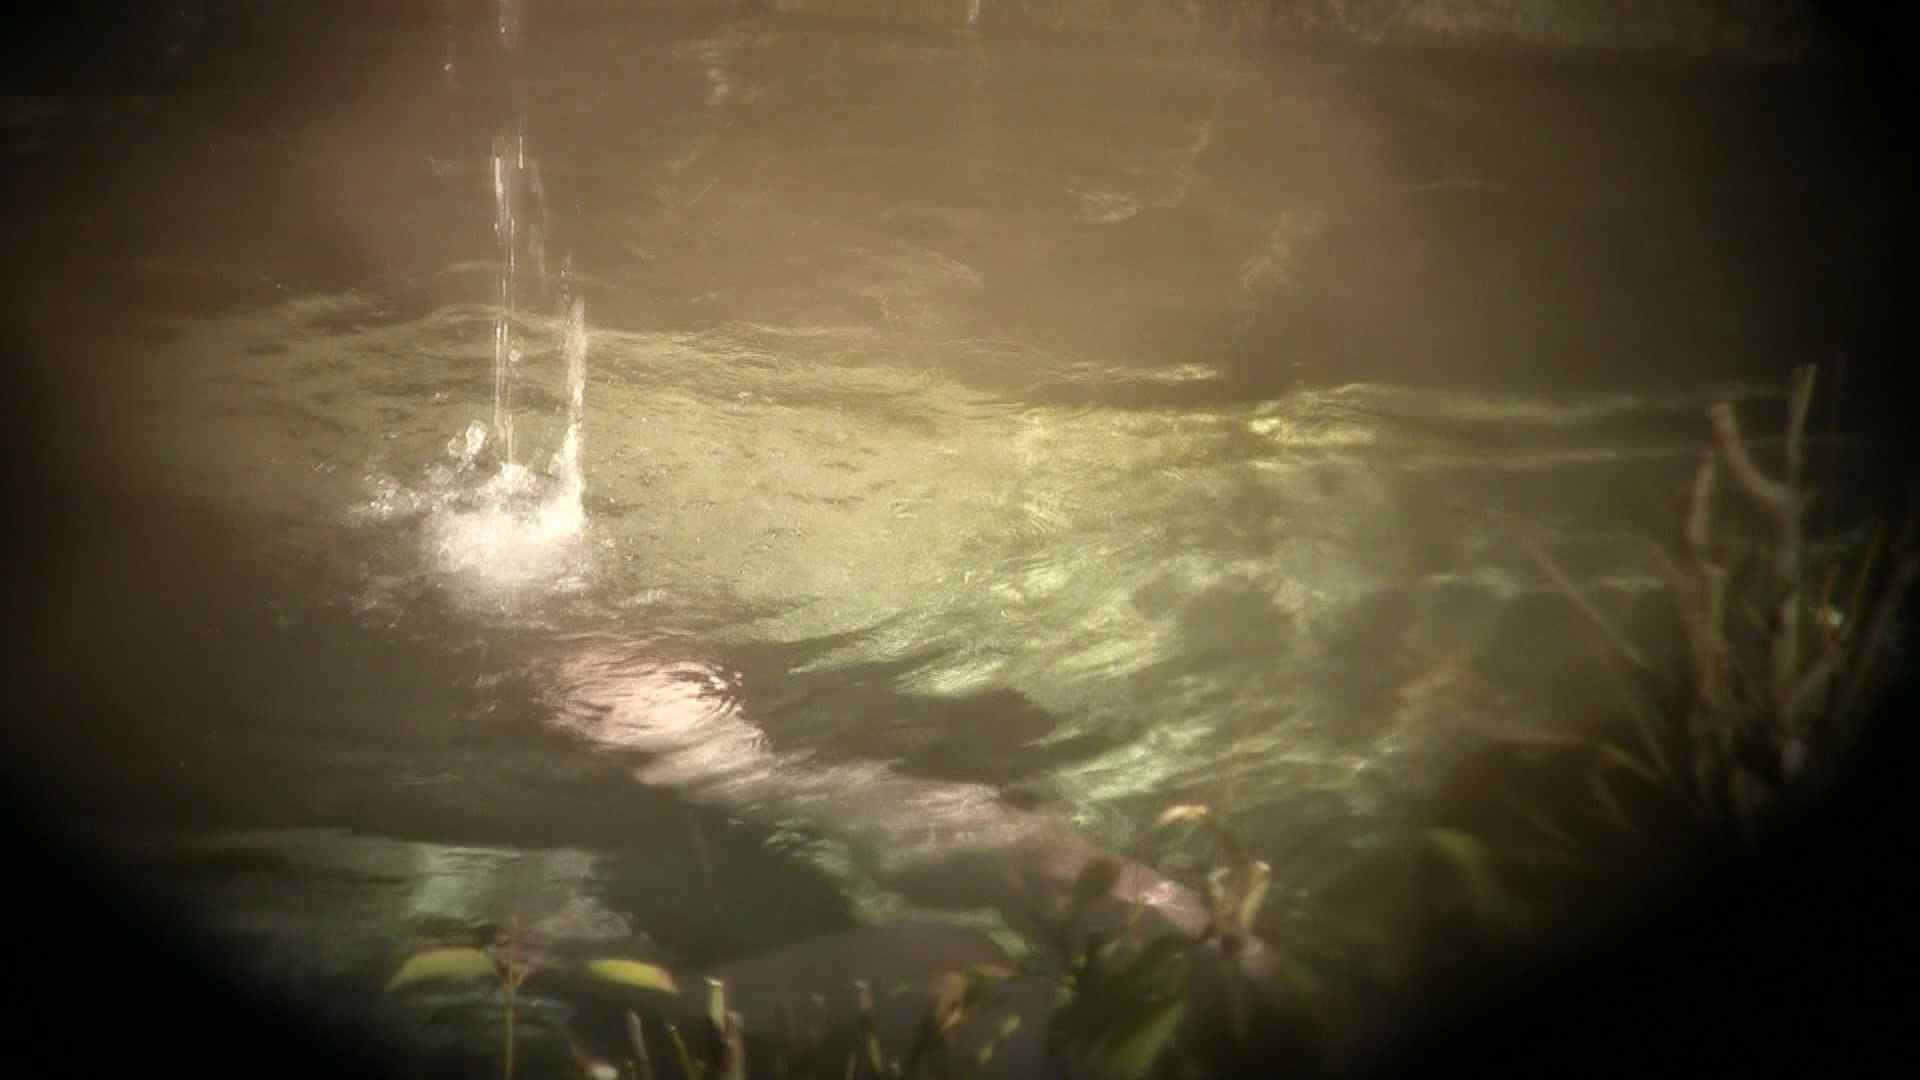 Aquaな露天風呂Vol.698 盗撮 AV無料動画キャプチャ 30PICs 20